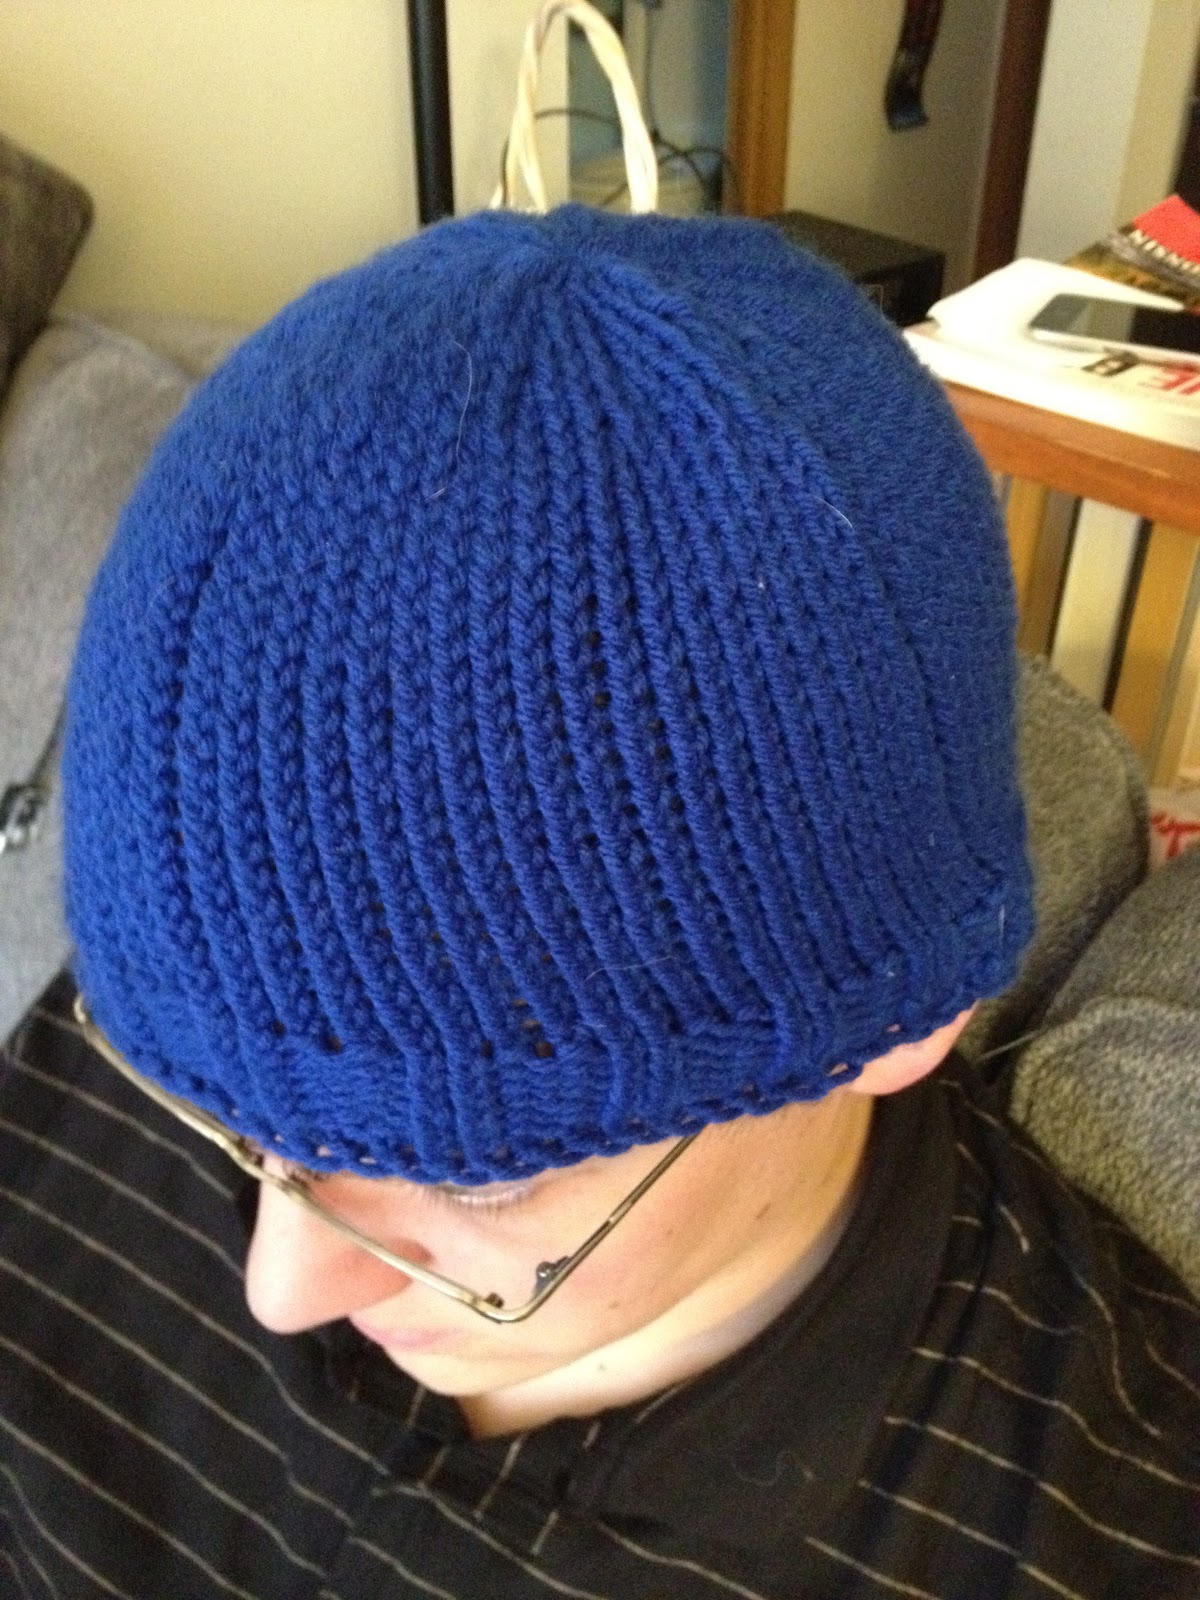 Knitting Pattern Sonic Hedgehog : BotanyBoeh: Sonic the Hedgehog Knit Hat